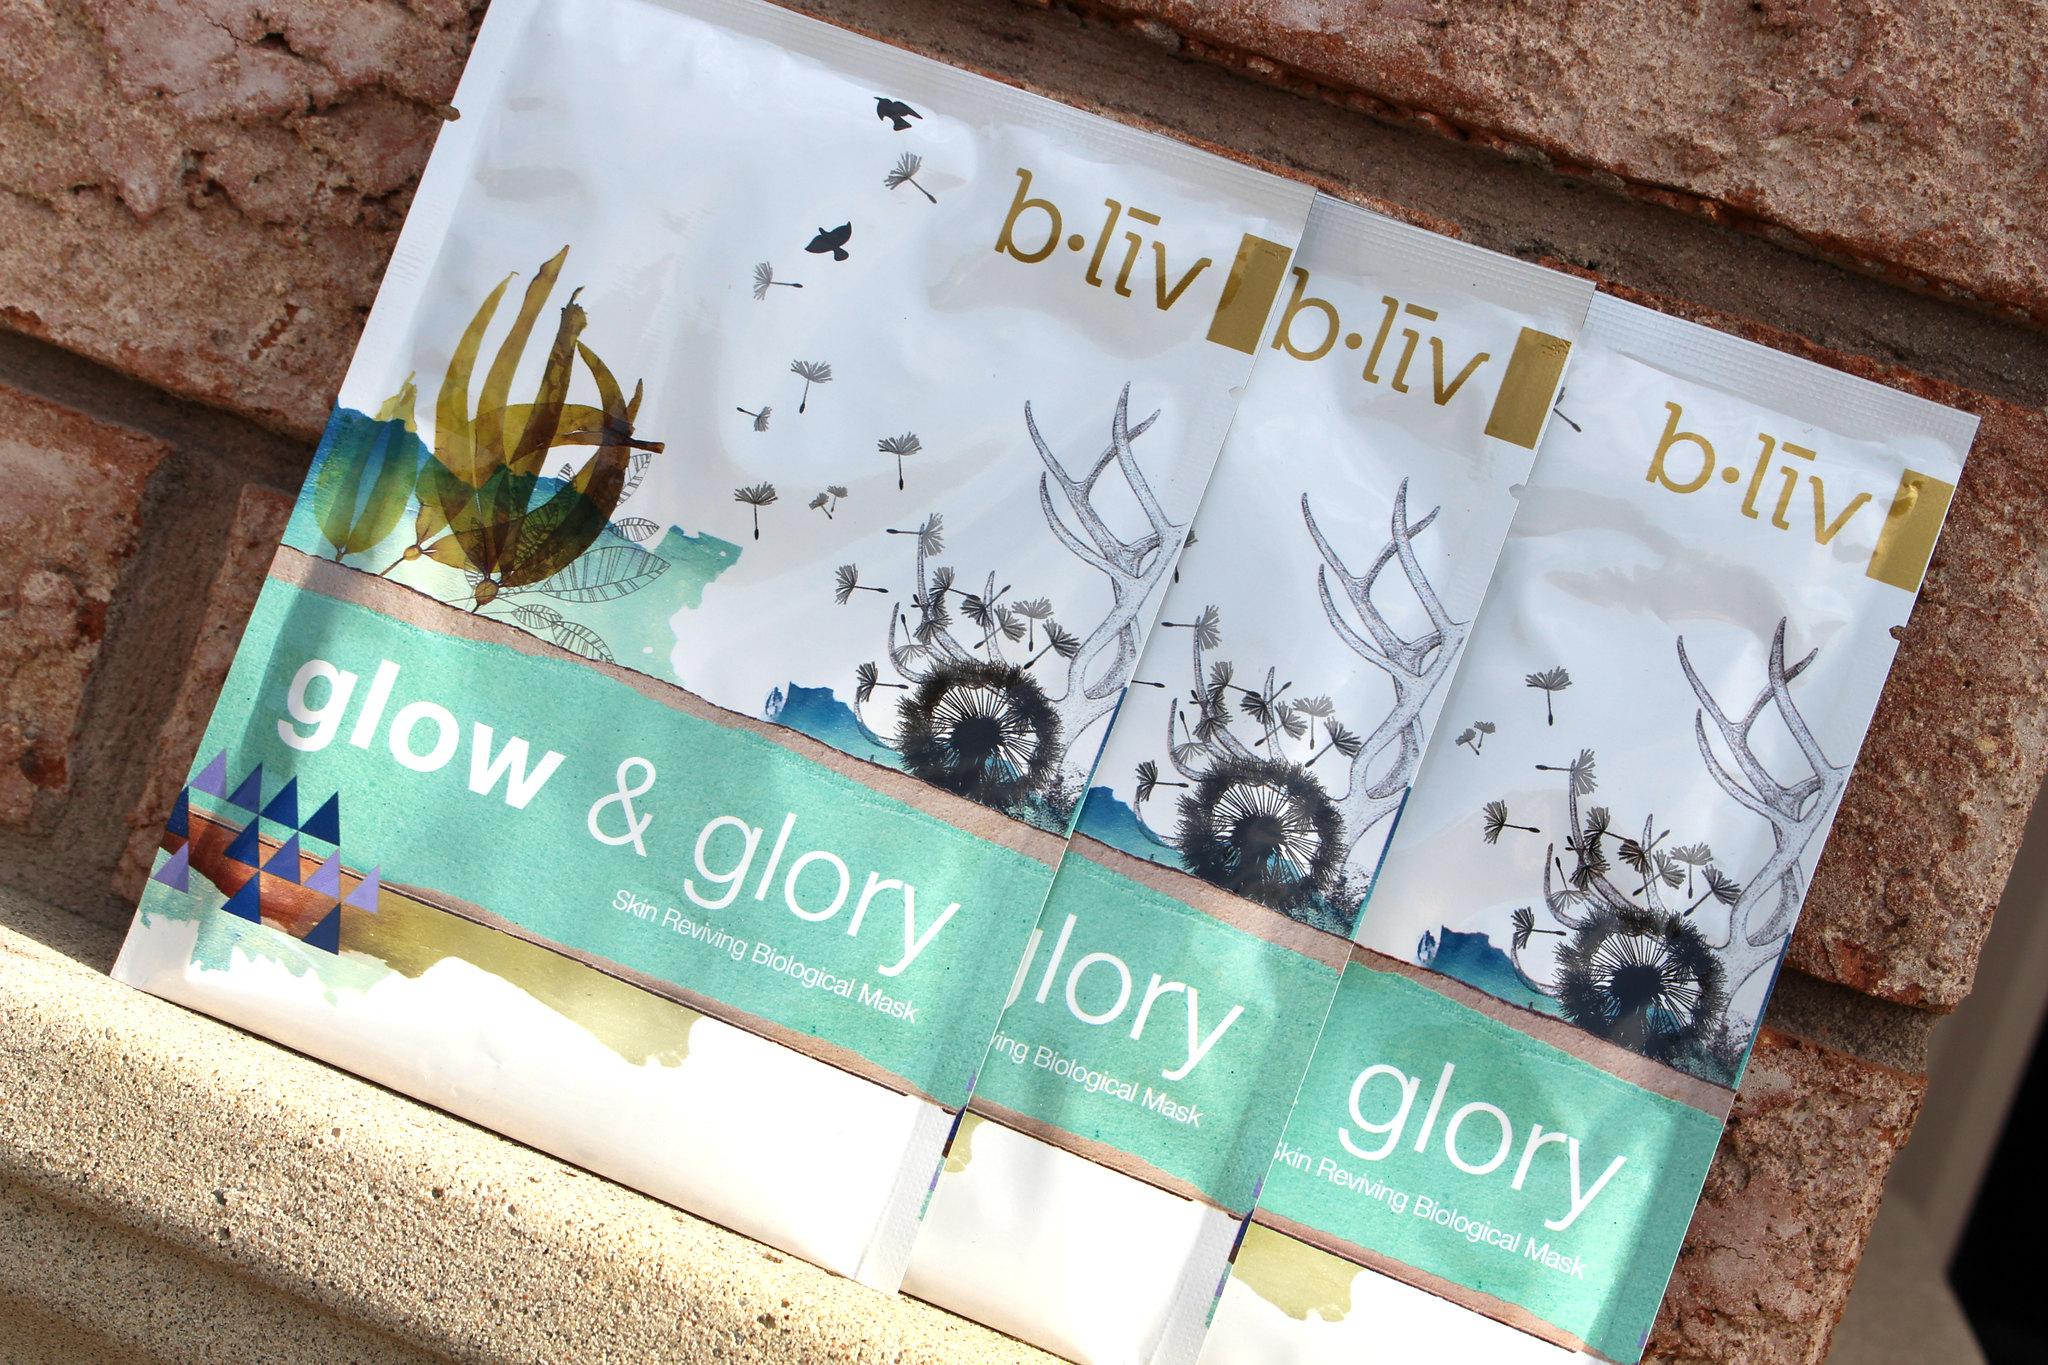 Bliv Glow & Glory Skin Reviving Biological Mask